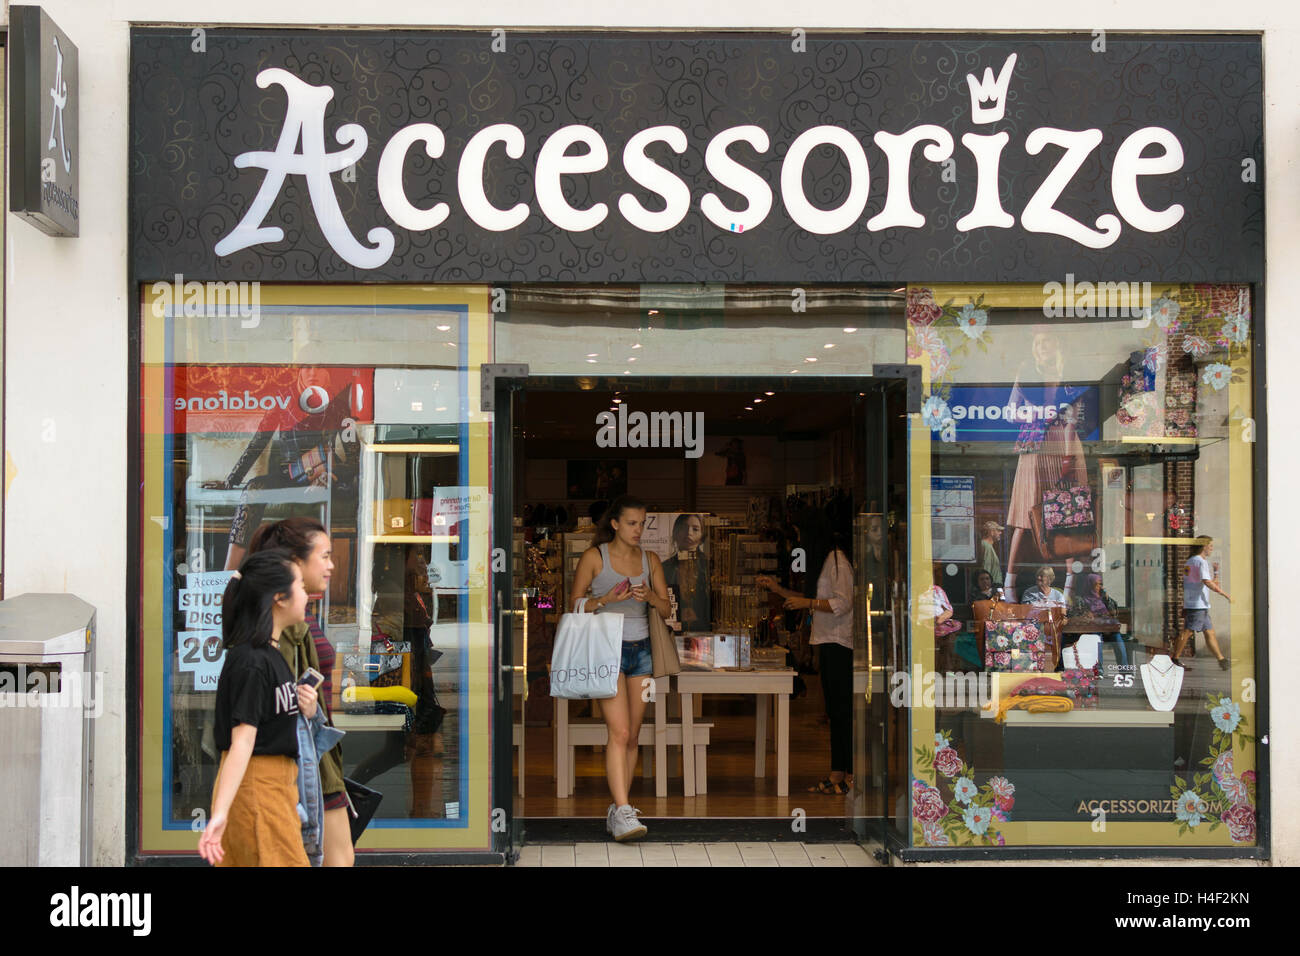 Exeter, Devon, England, UK - 30 September 2016: Accessorize shop windows on High street.Stock Photo